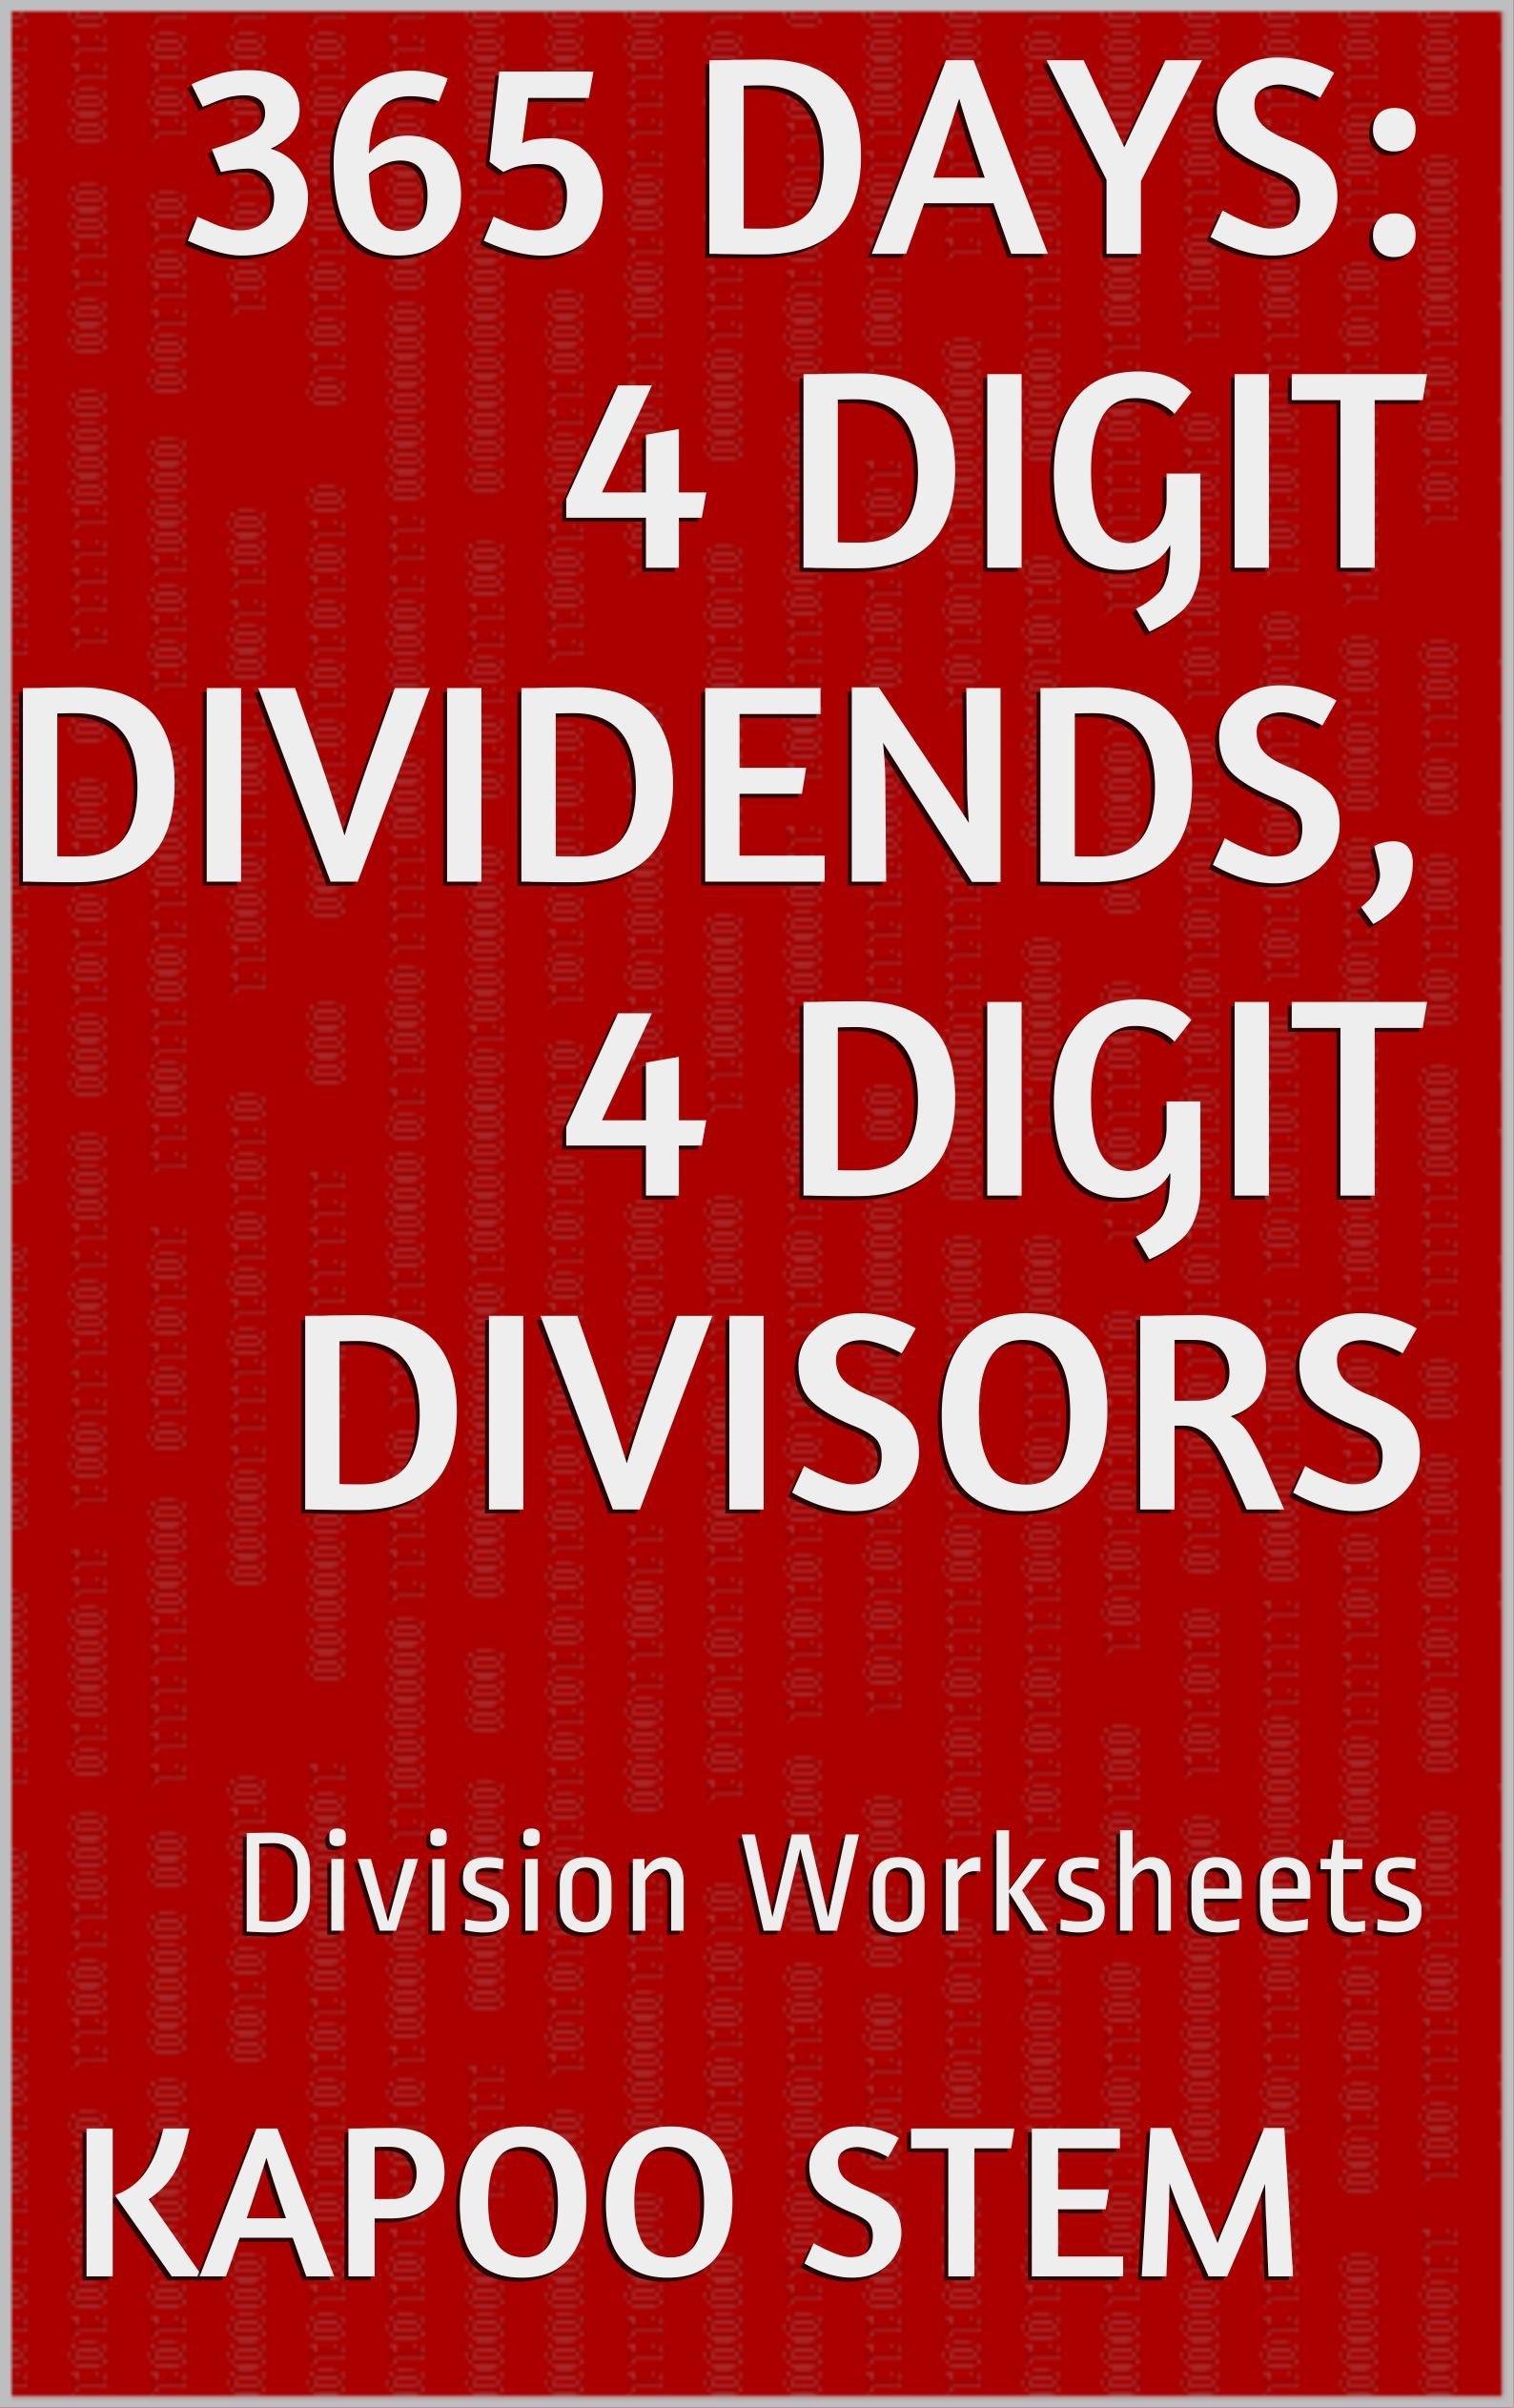 365 Division Worksheets With 4 Digit Dividends 4 Digit